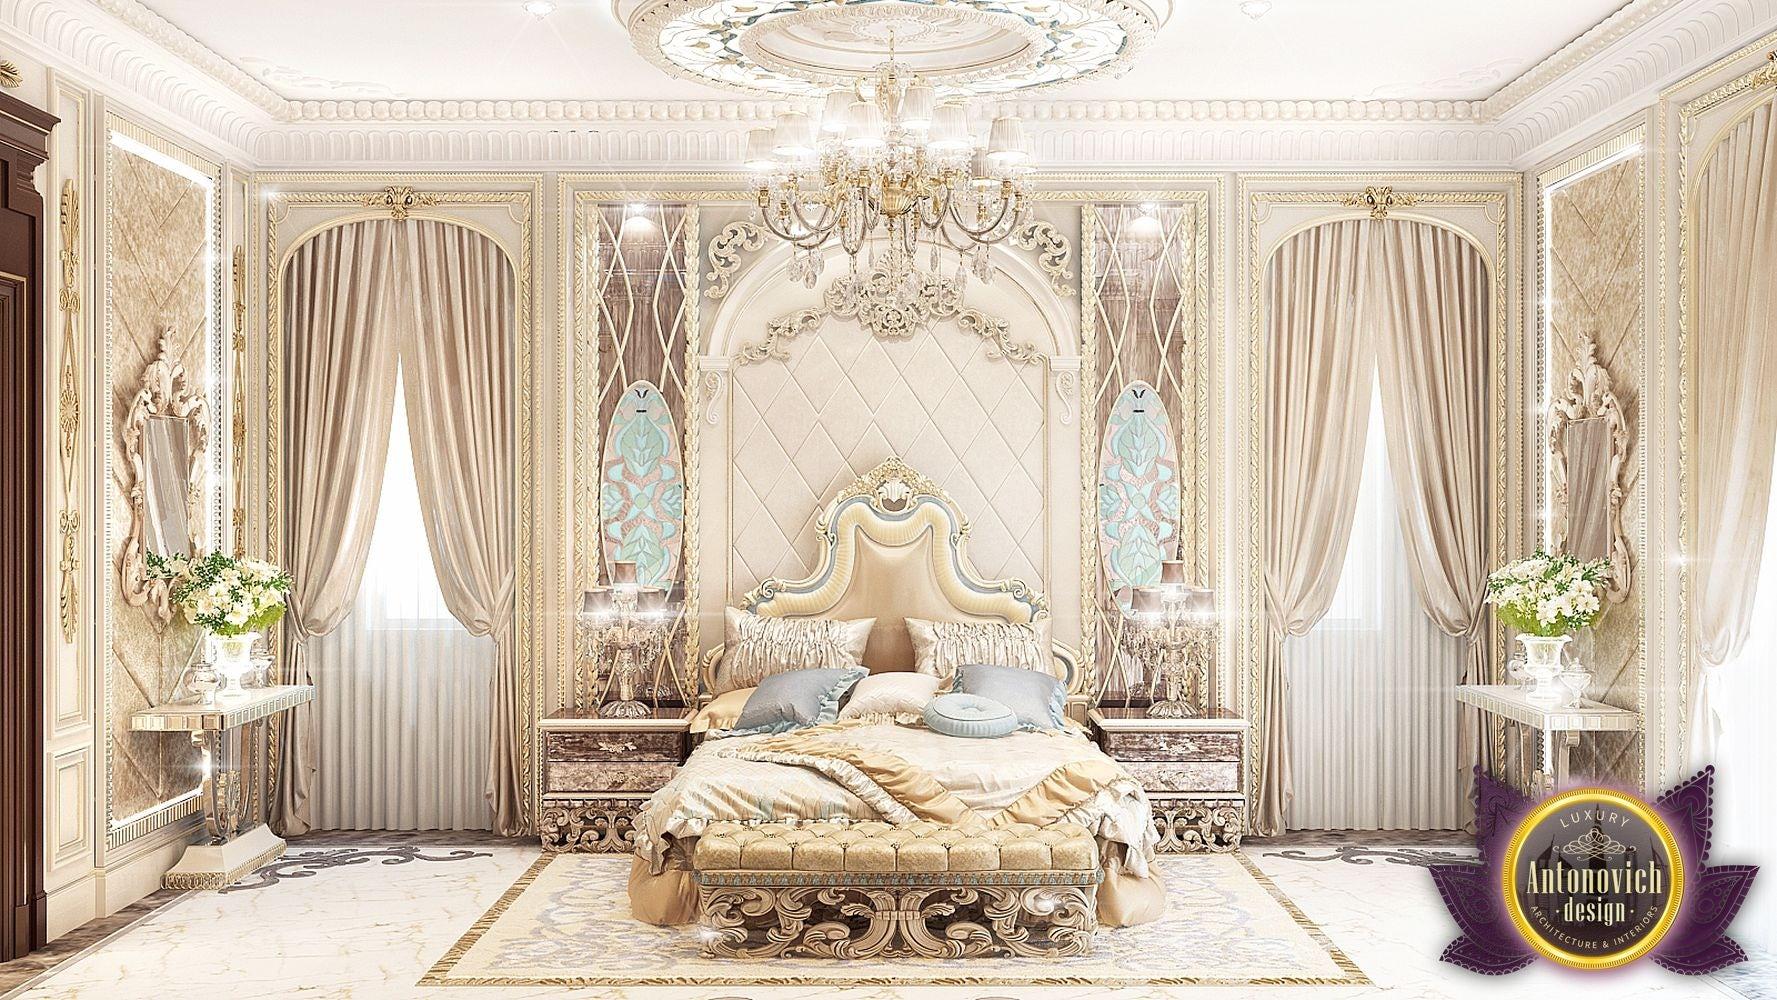 Luxury Royal Arabic Master Bedroom Of Luxury Antonovich